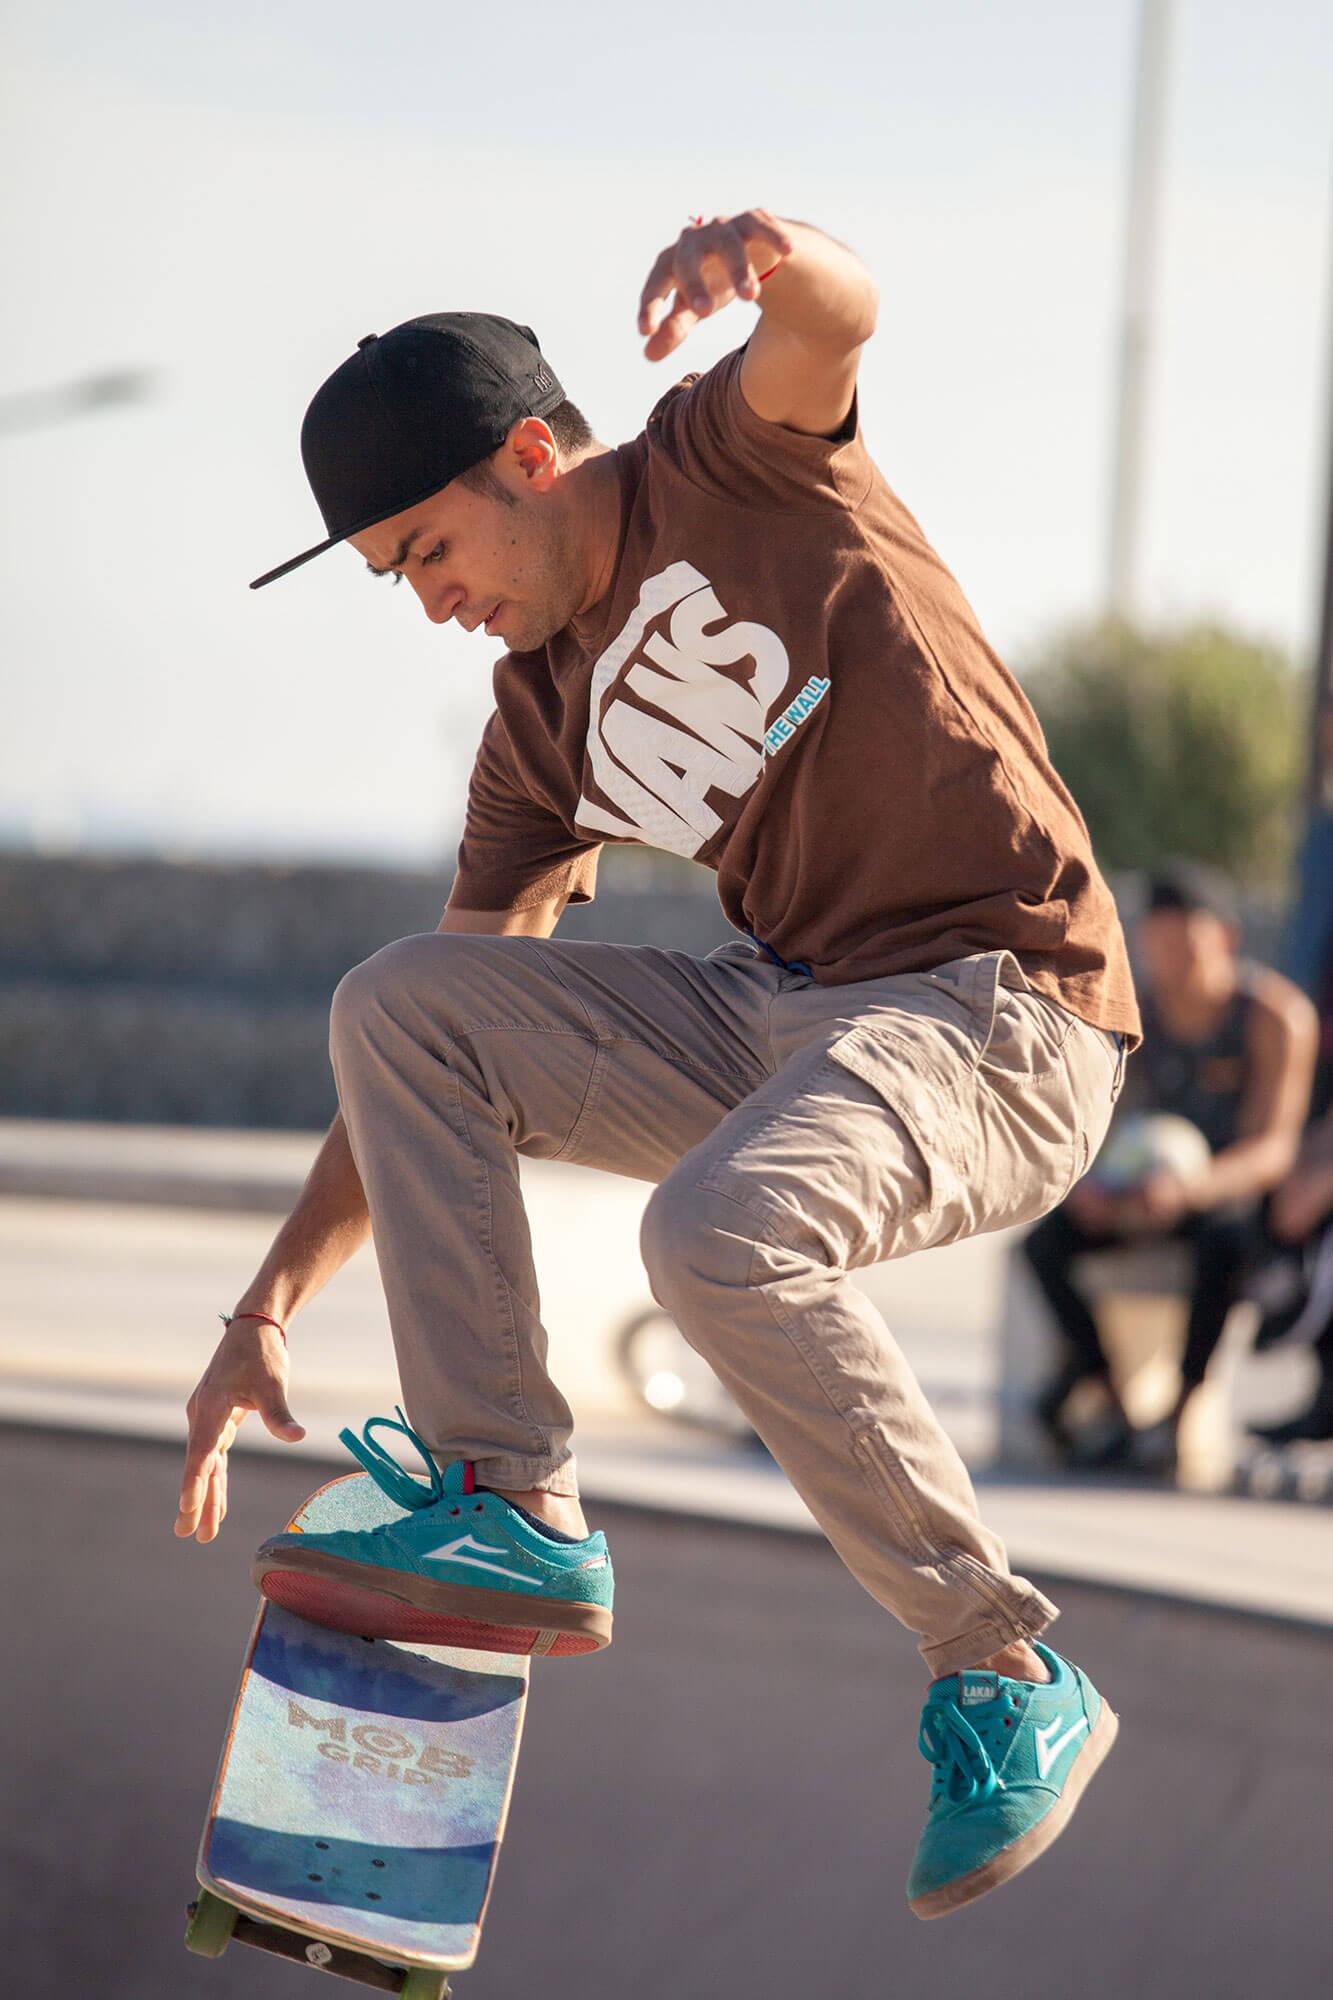 Rider street skate